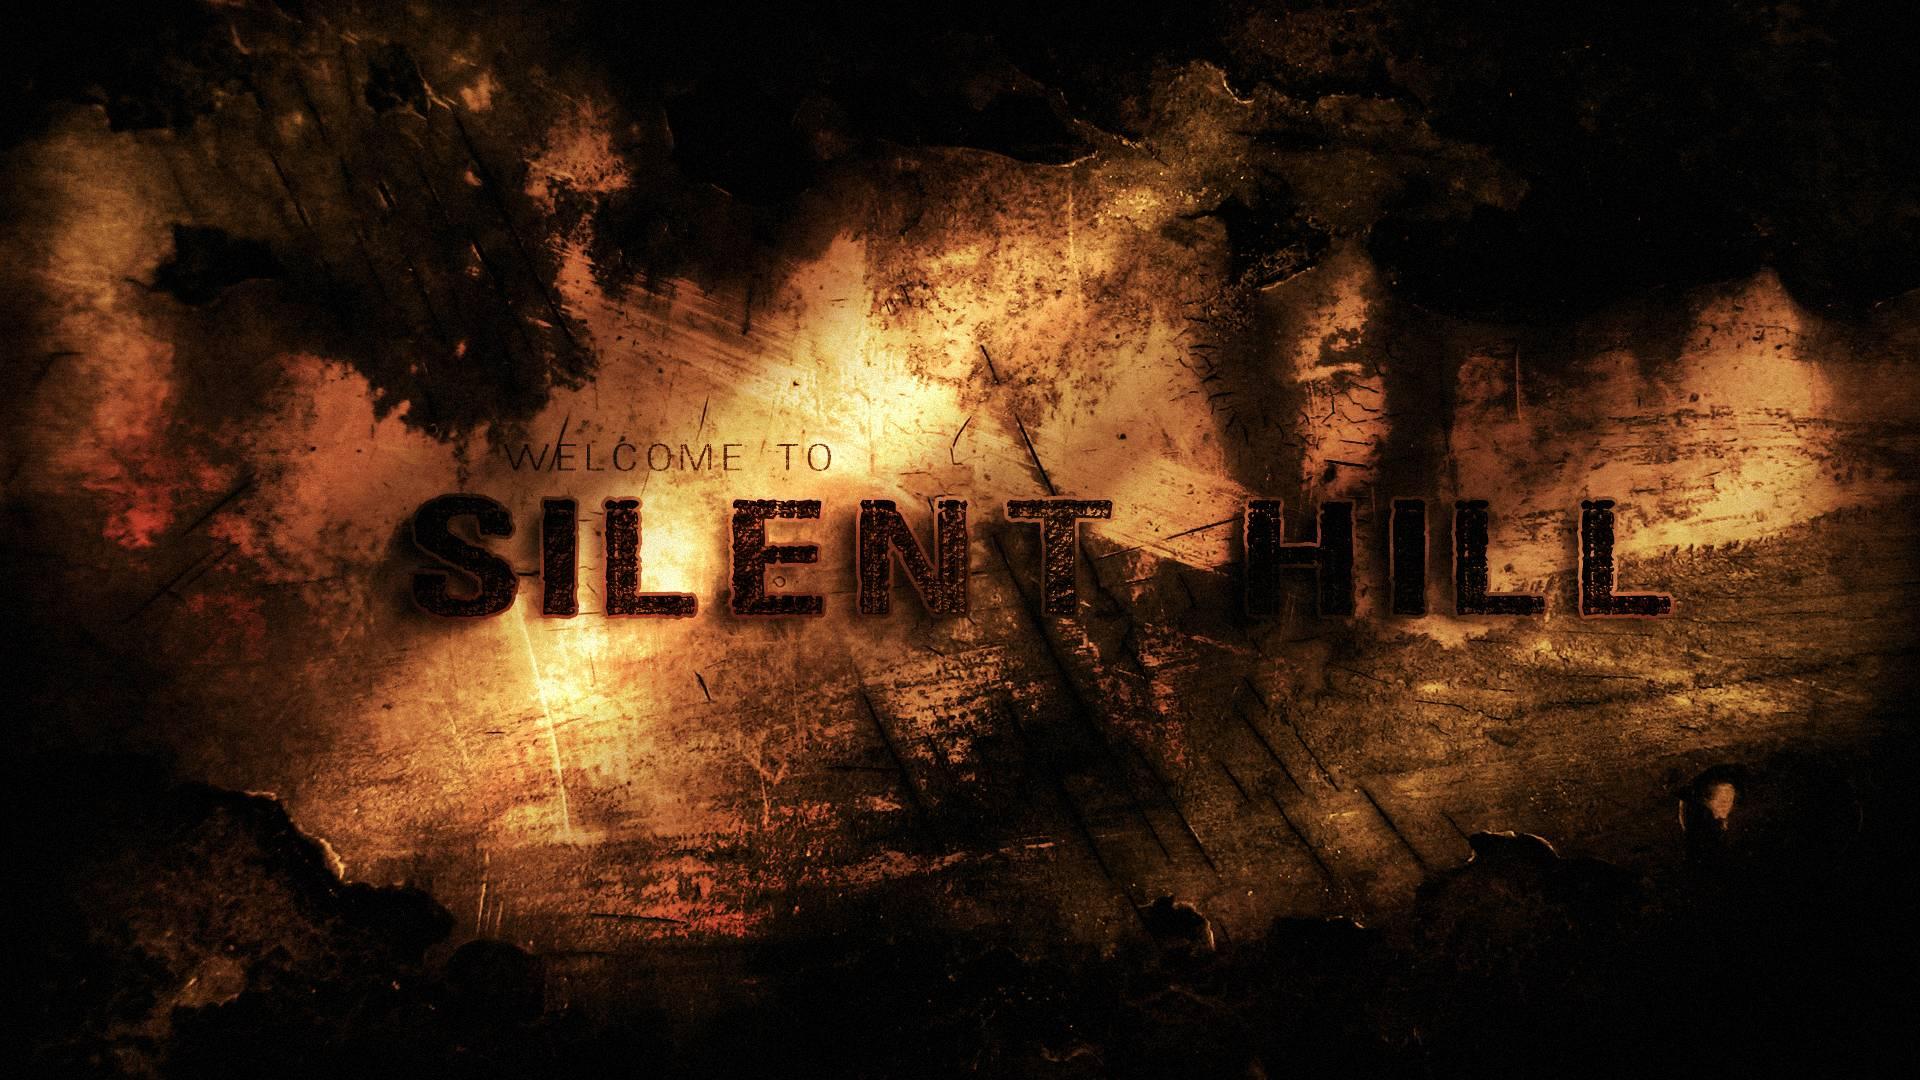 196415-silent-hill-saga-silent-hill-wall